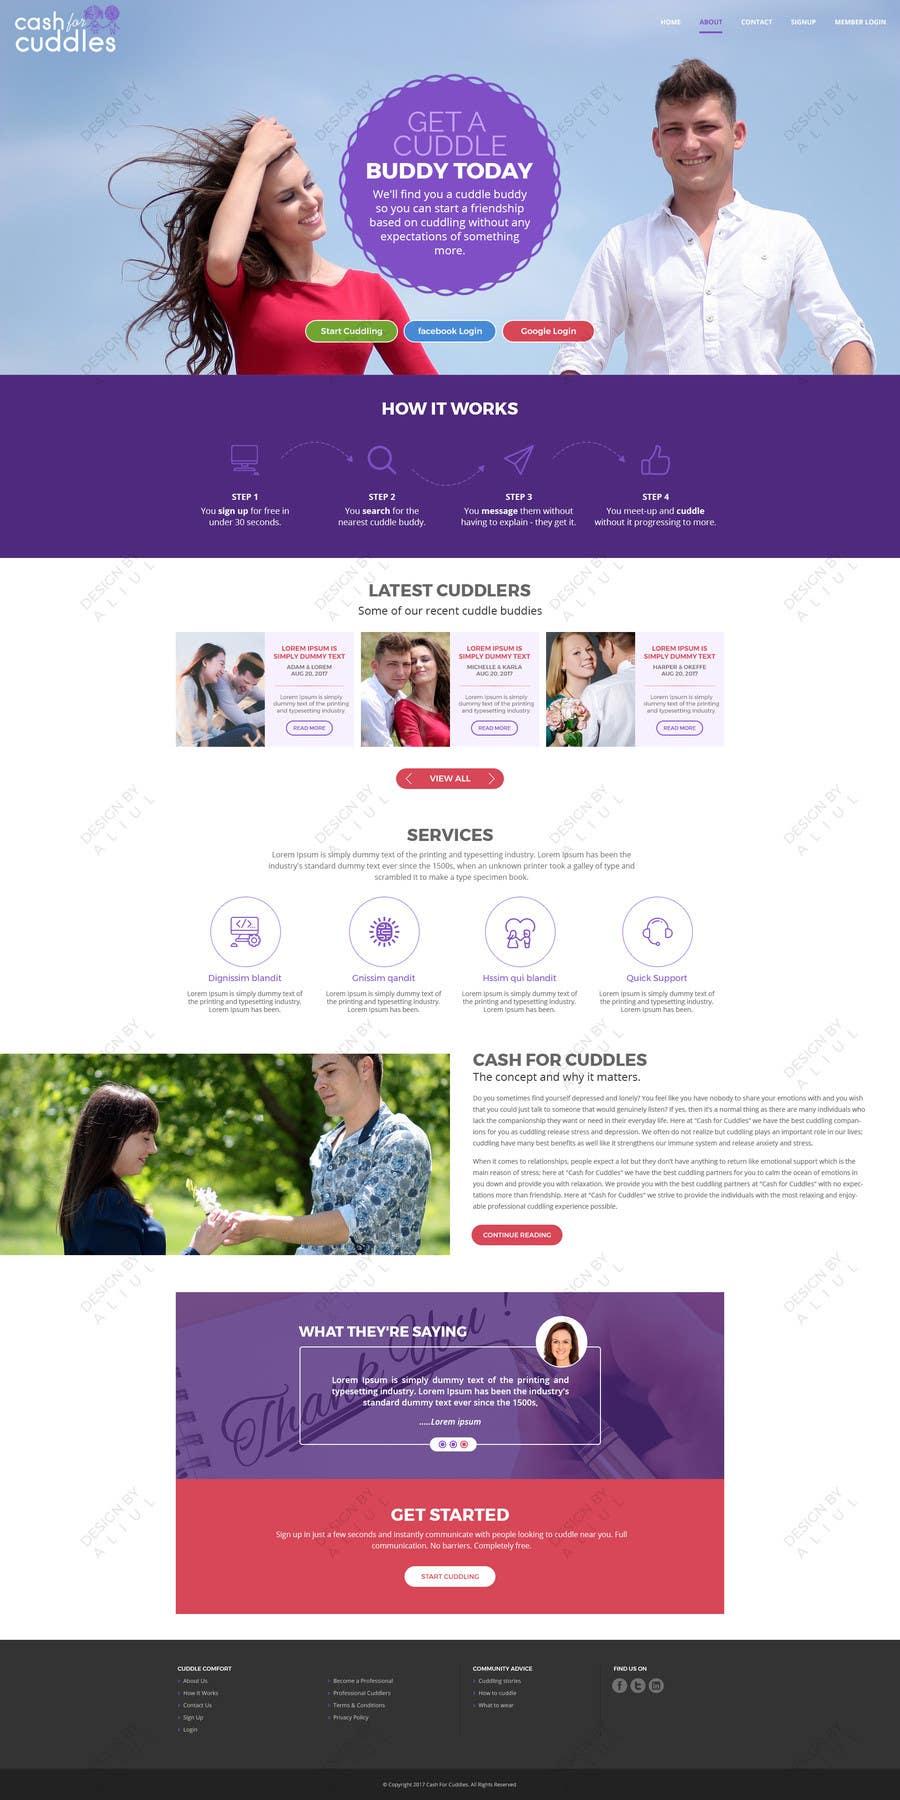 Penyertaan Peraduan #15 untuk Design a Website Mock-up